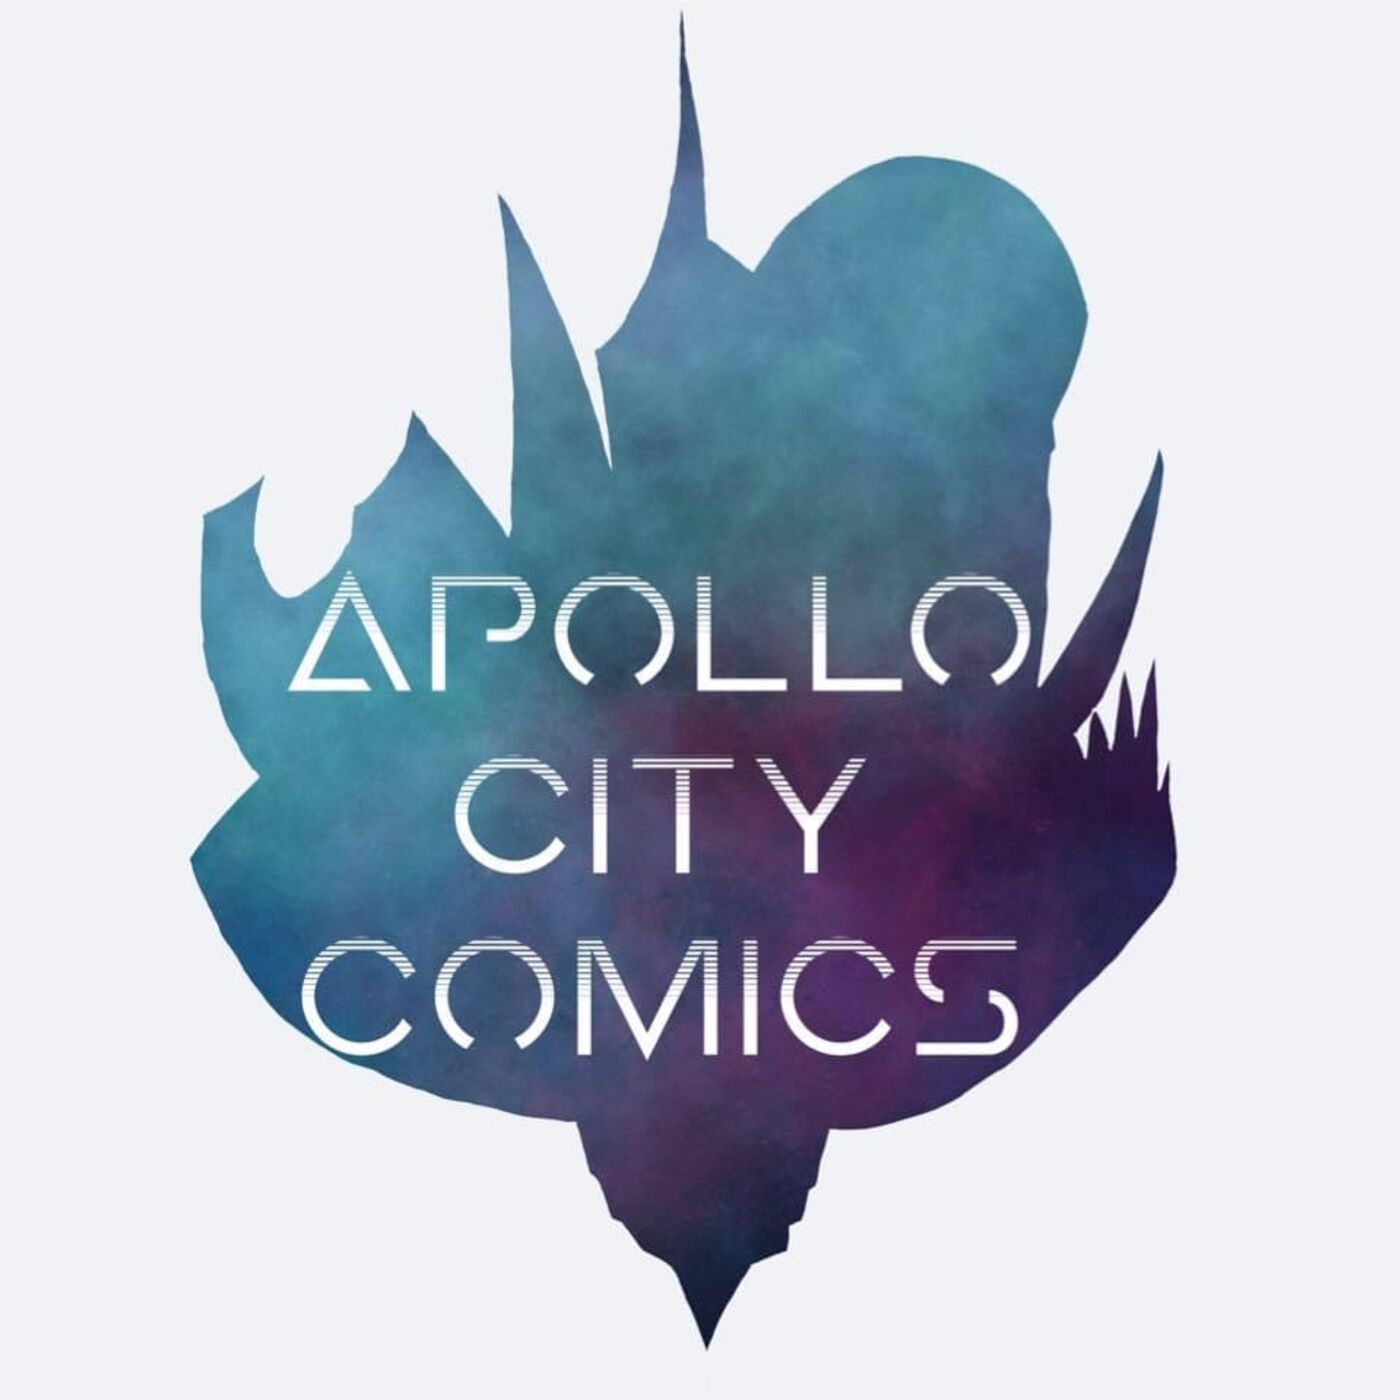 Episode 82: Apollo City Comics Podcast